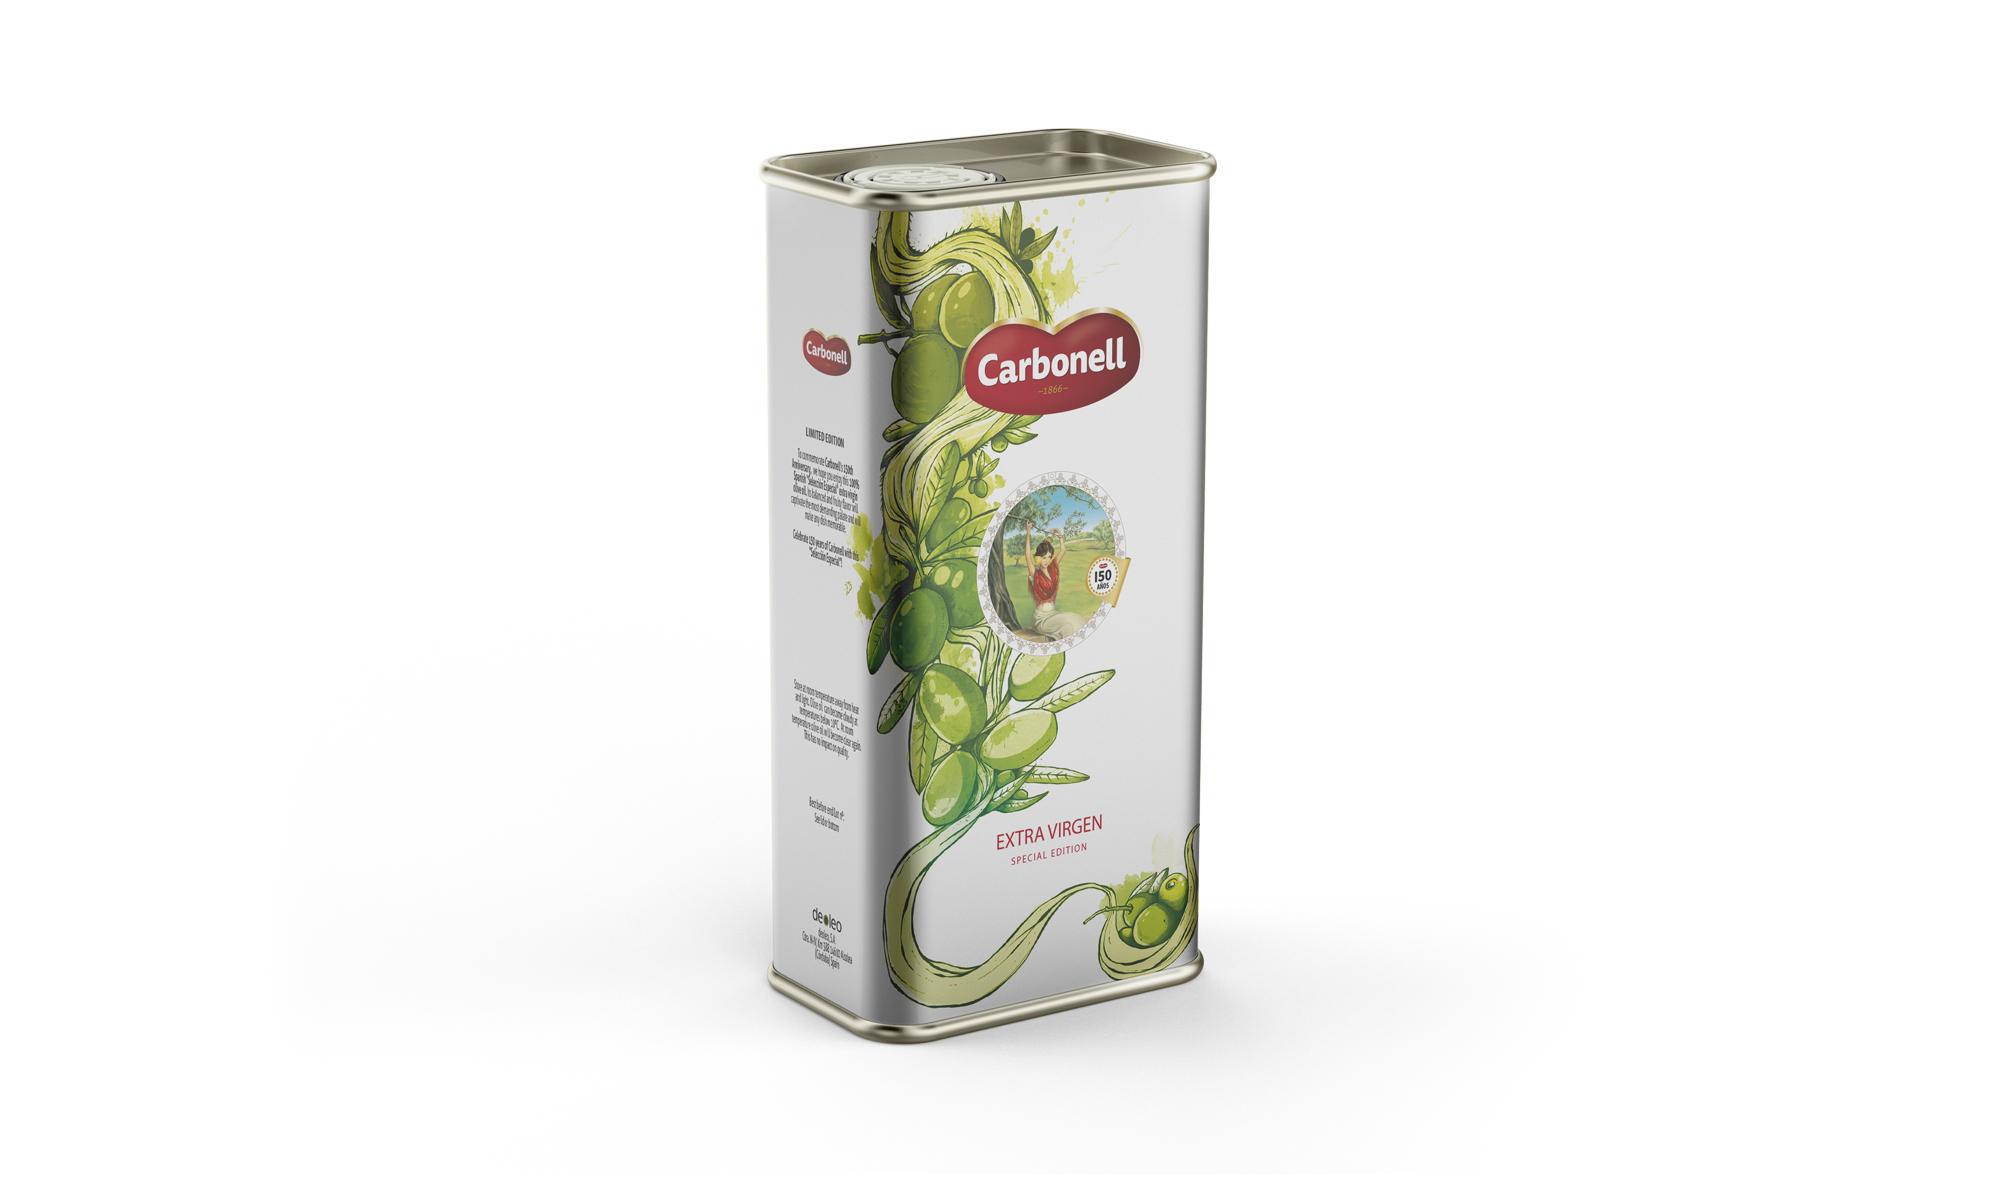 Elephant Estudio - Carbonell Olive Oil6.jpg